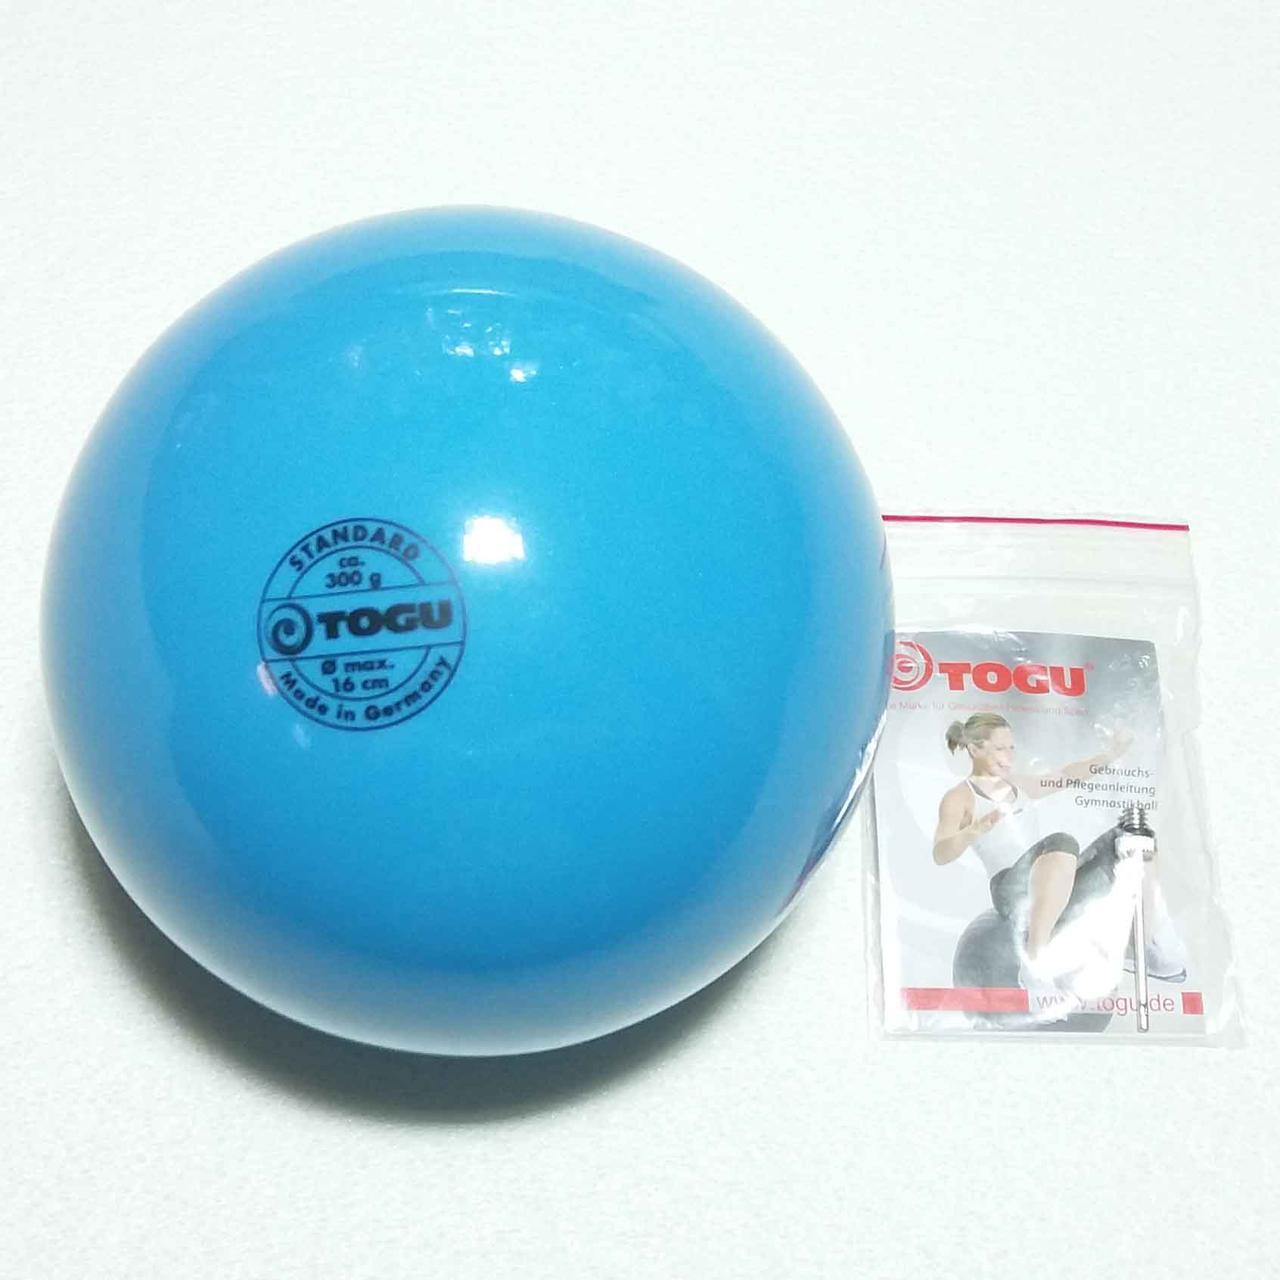 М'яч художньої гімнастики Togu FIG 300 гр, 16 см